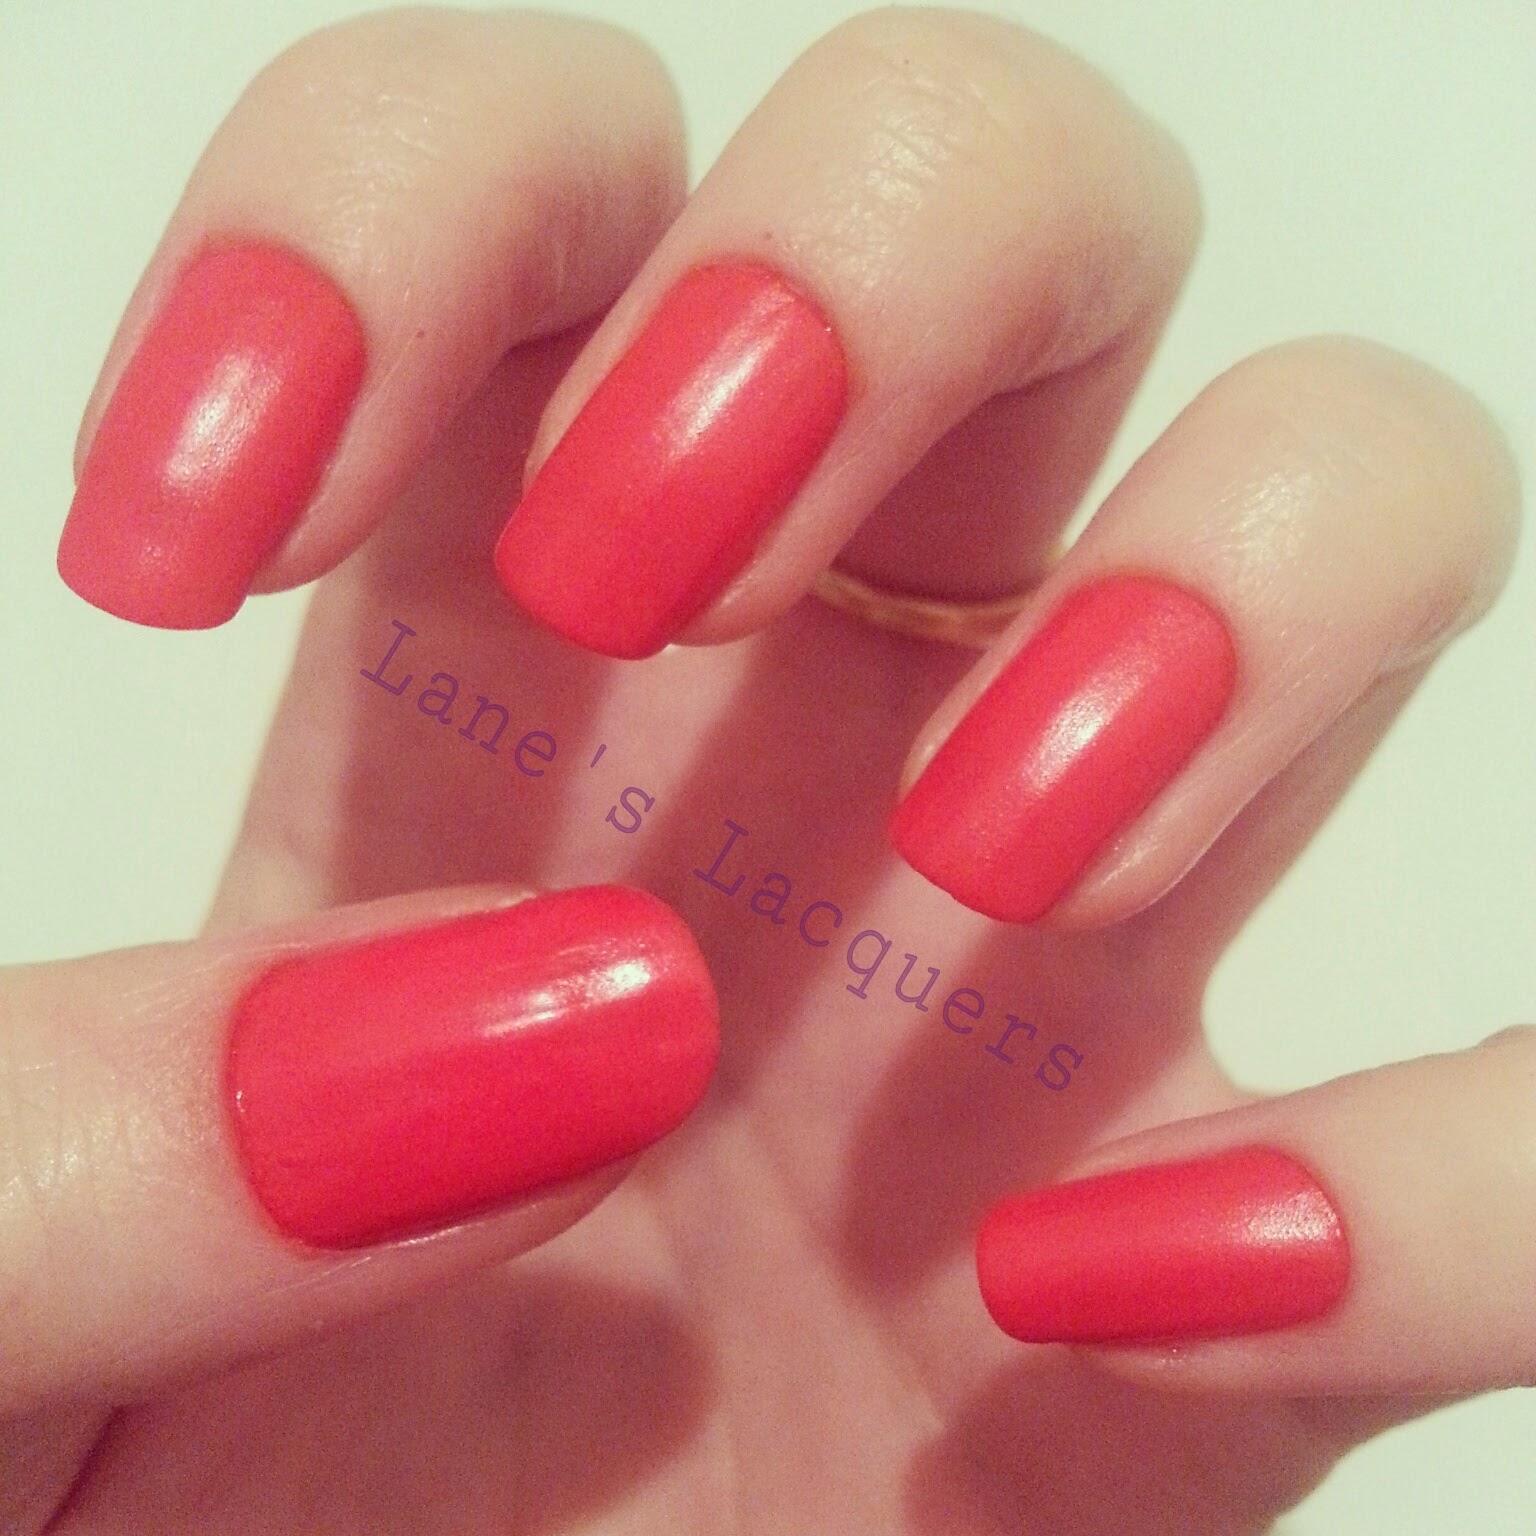 barry-m-copacabana-swatch-manicure (1)